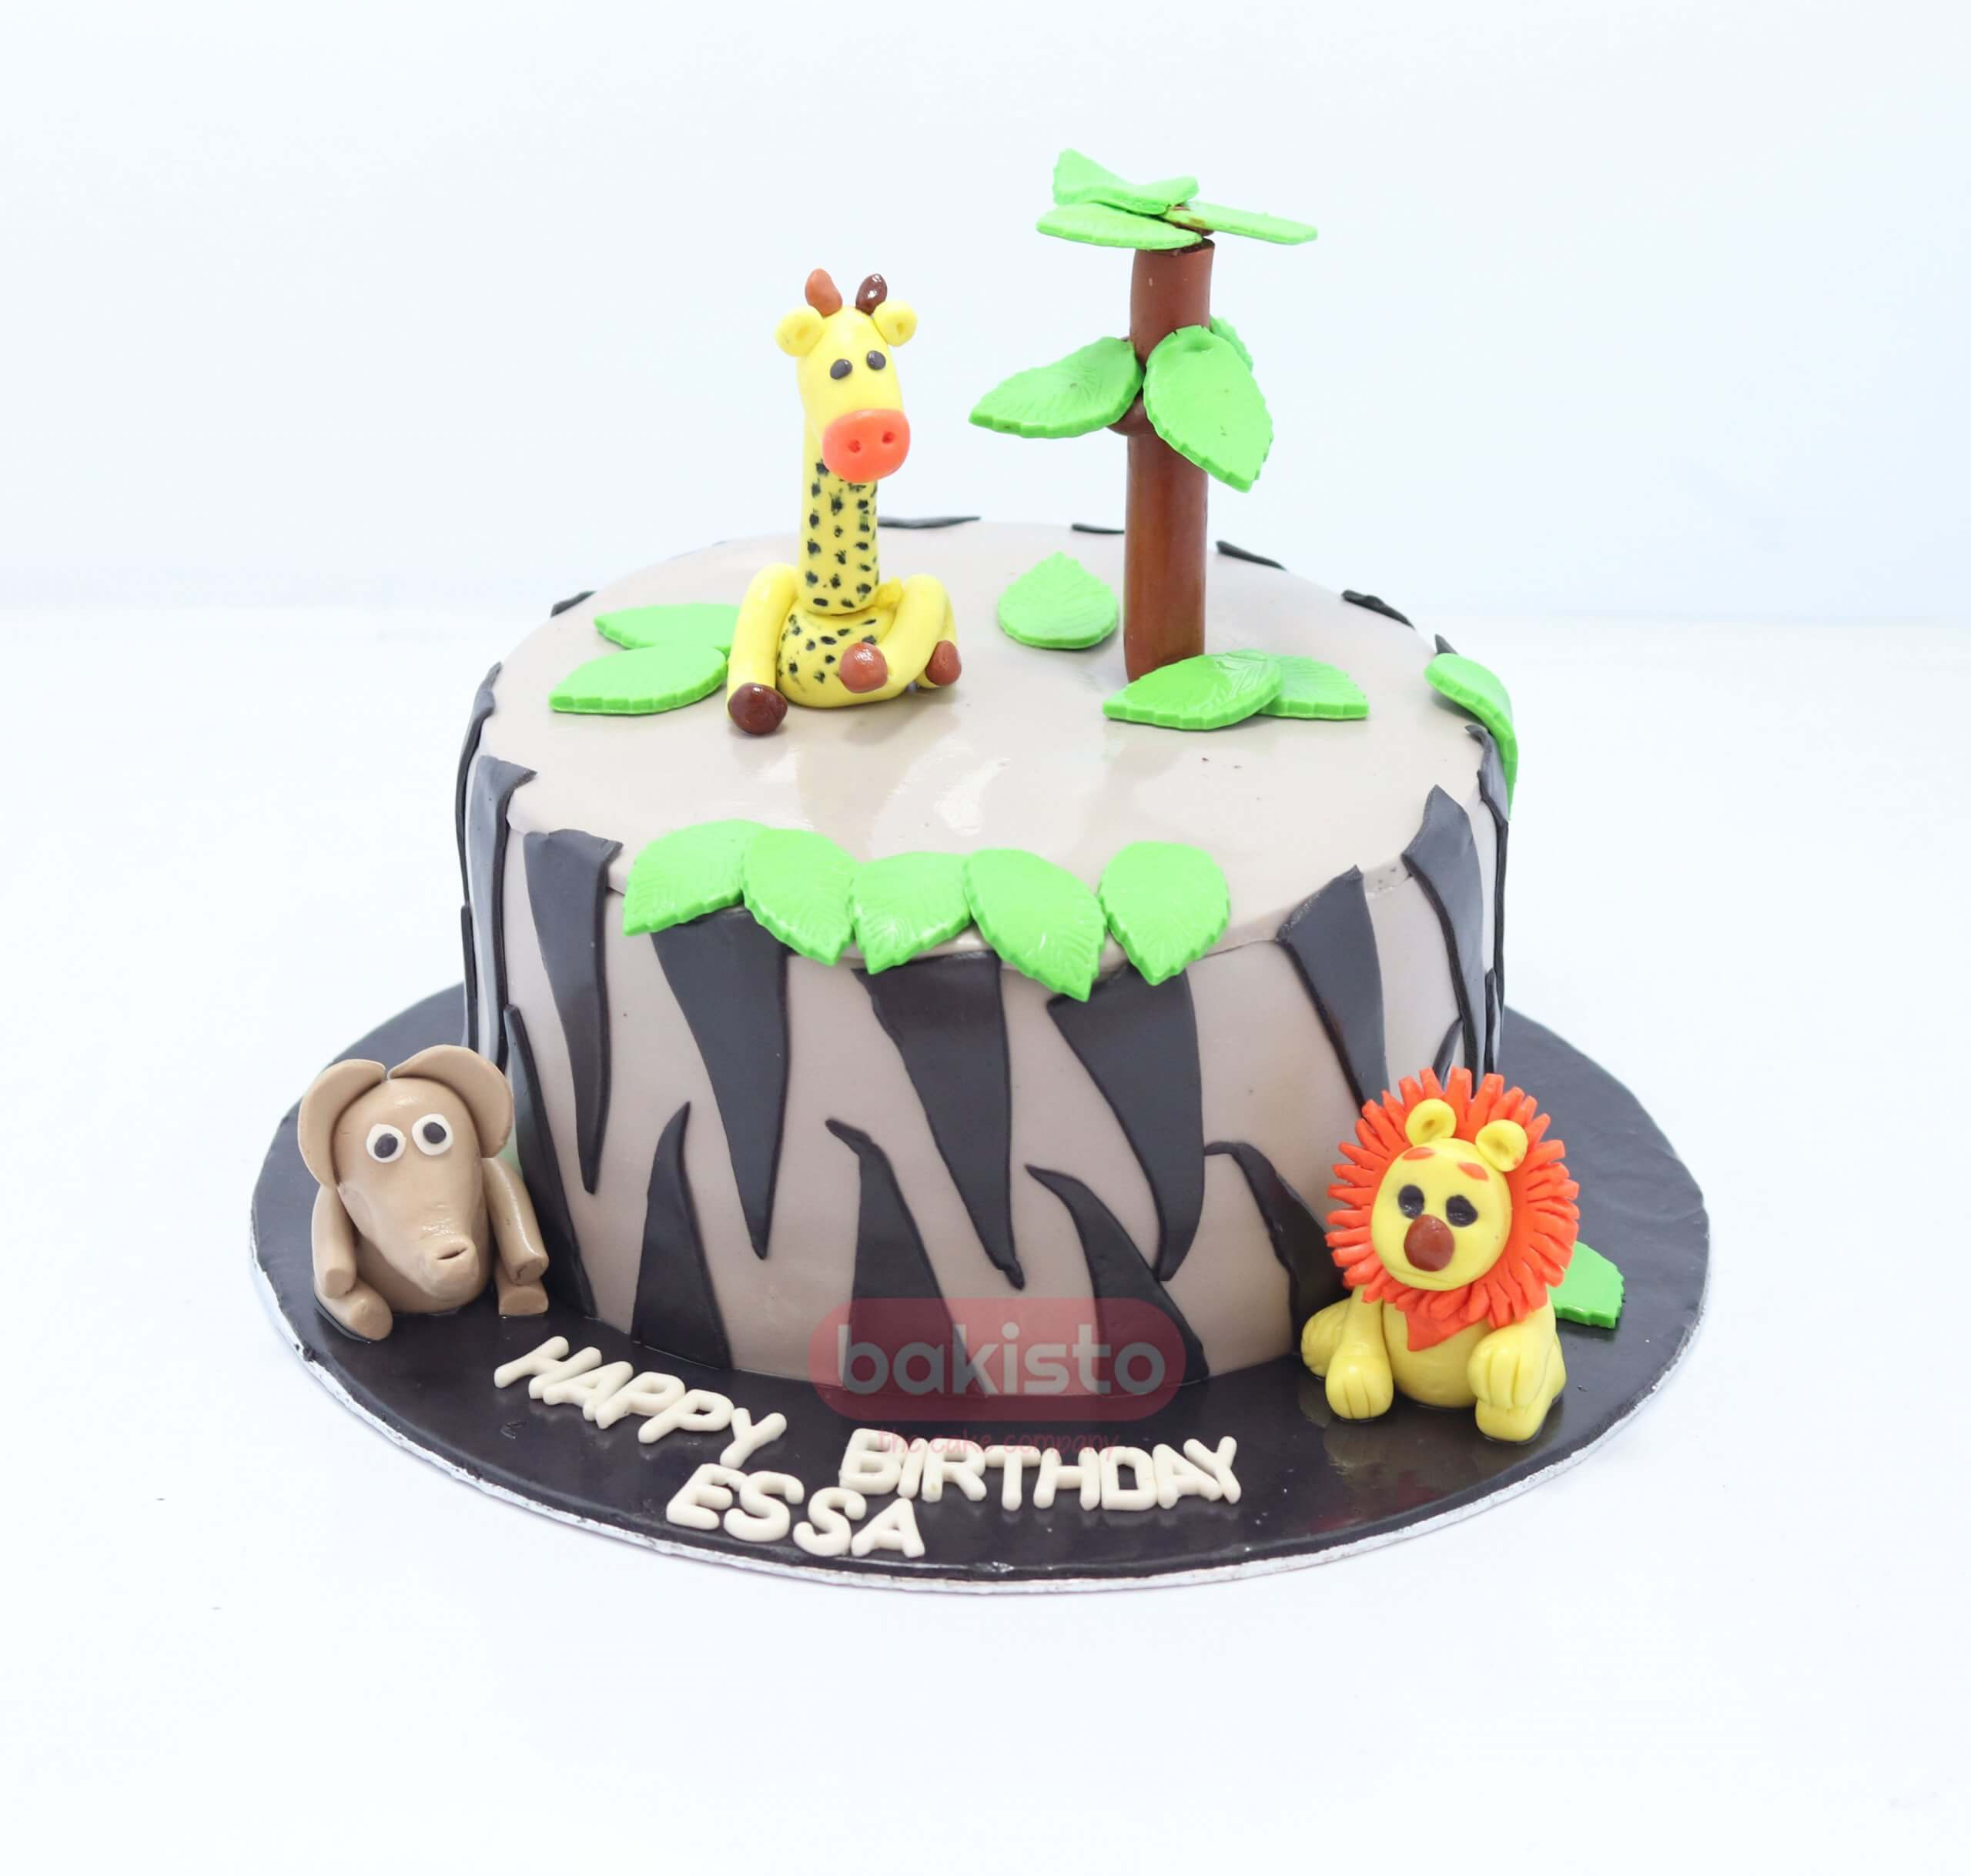 Surprising Customized Zoo Theme Birthday Cake By Bakisto The Cake Company Funny Birthday Cards Online Amentibdeldamsfinfo